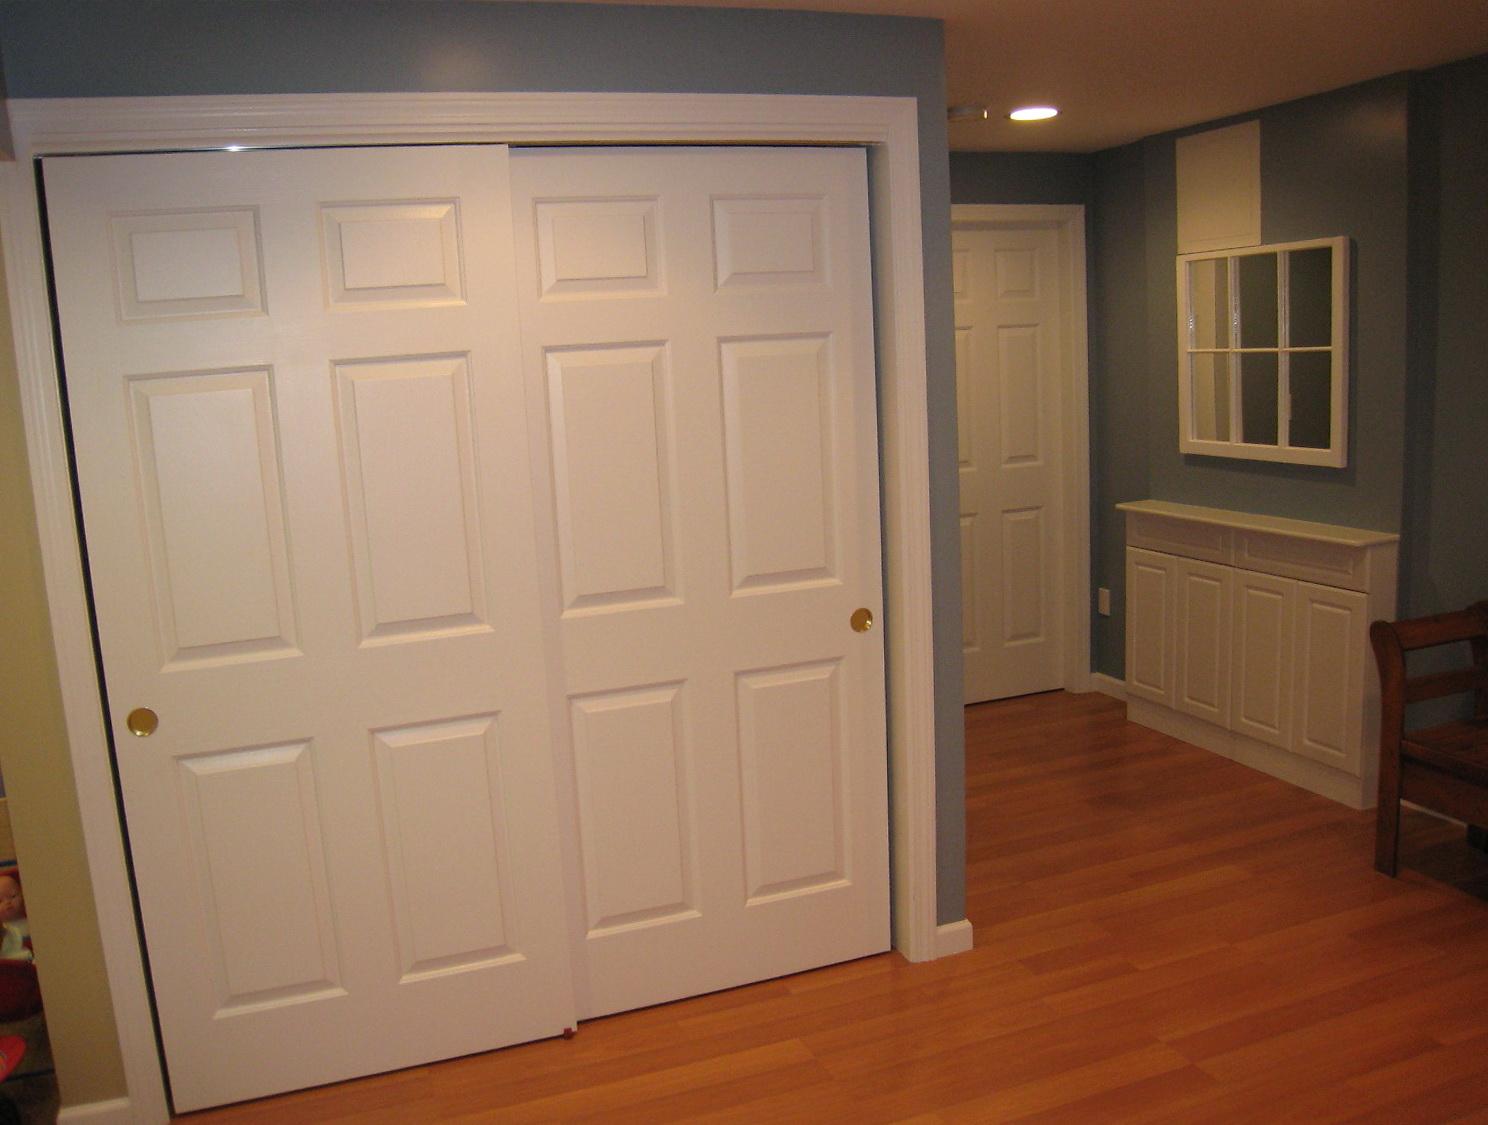 Hanging Sliding Doors For Closets